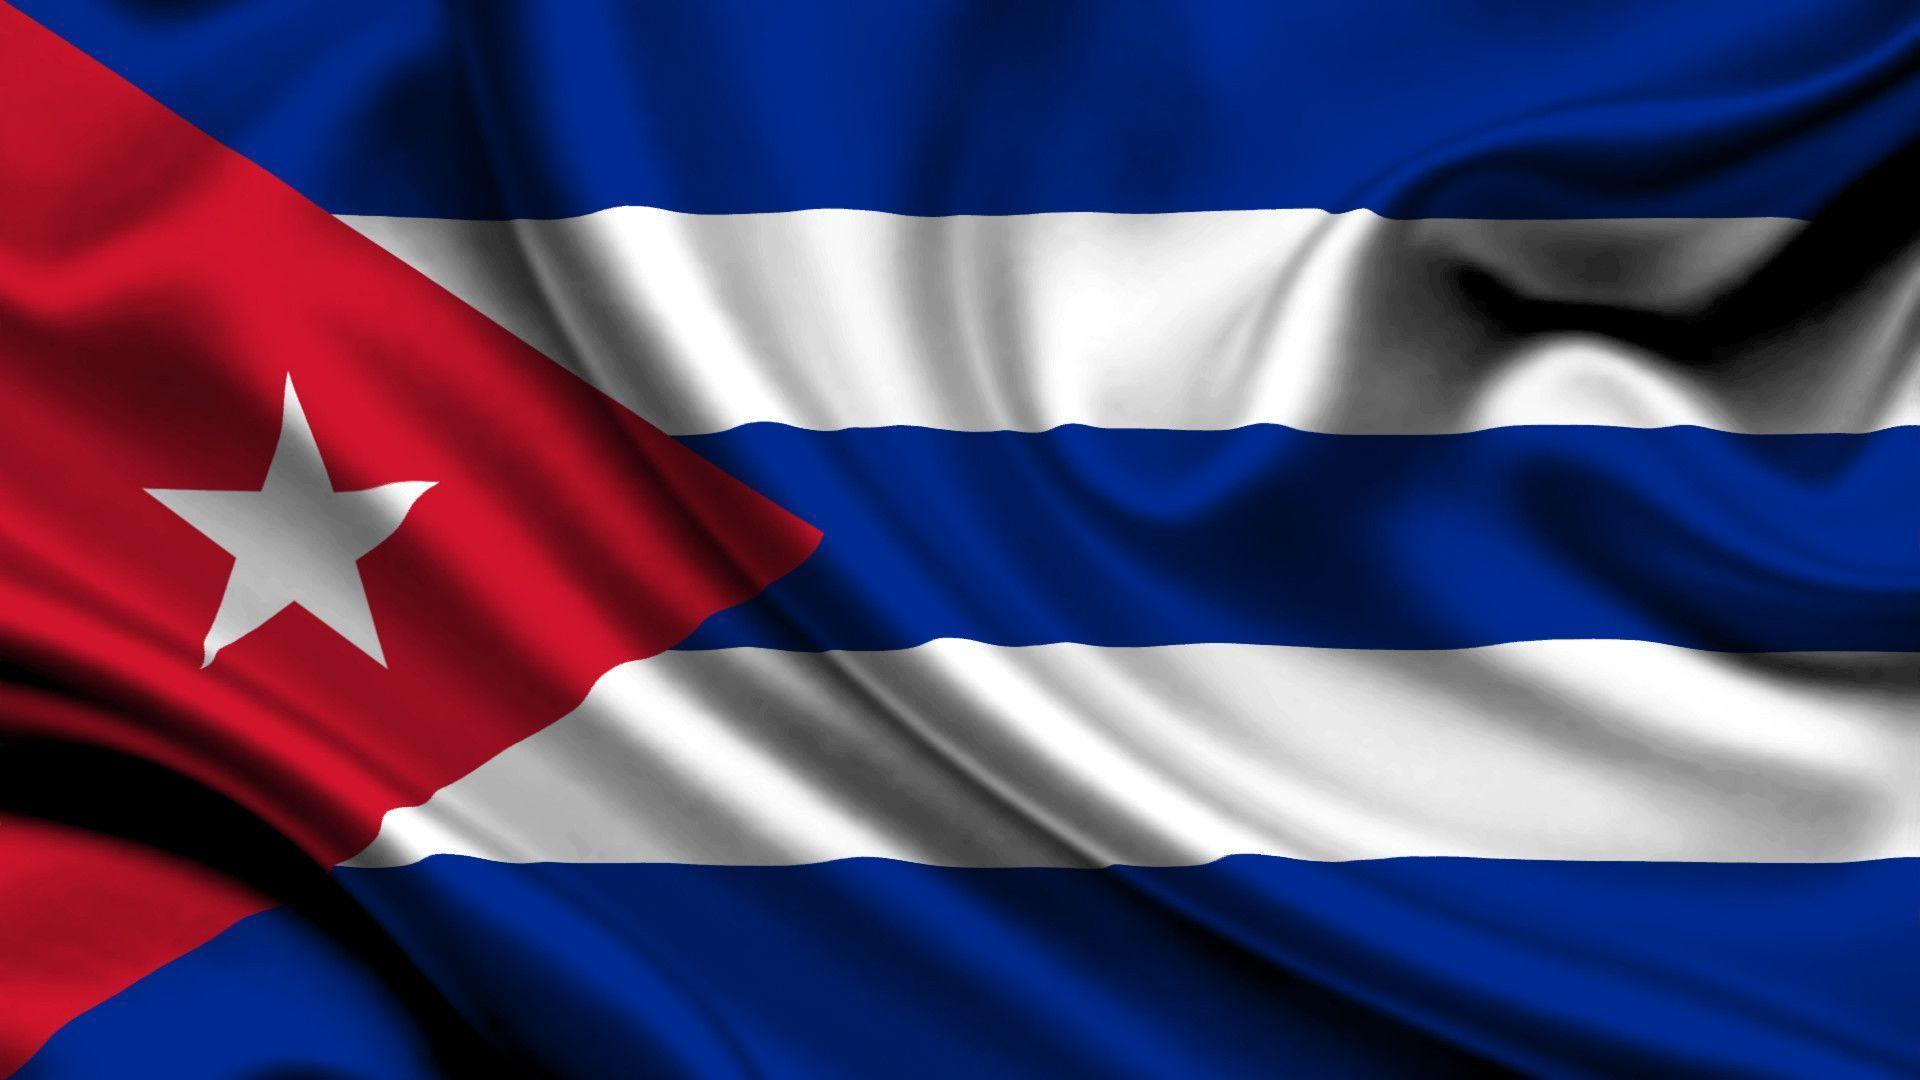 Cuban Flag Wallpapers 1920x1080